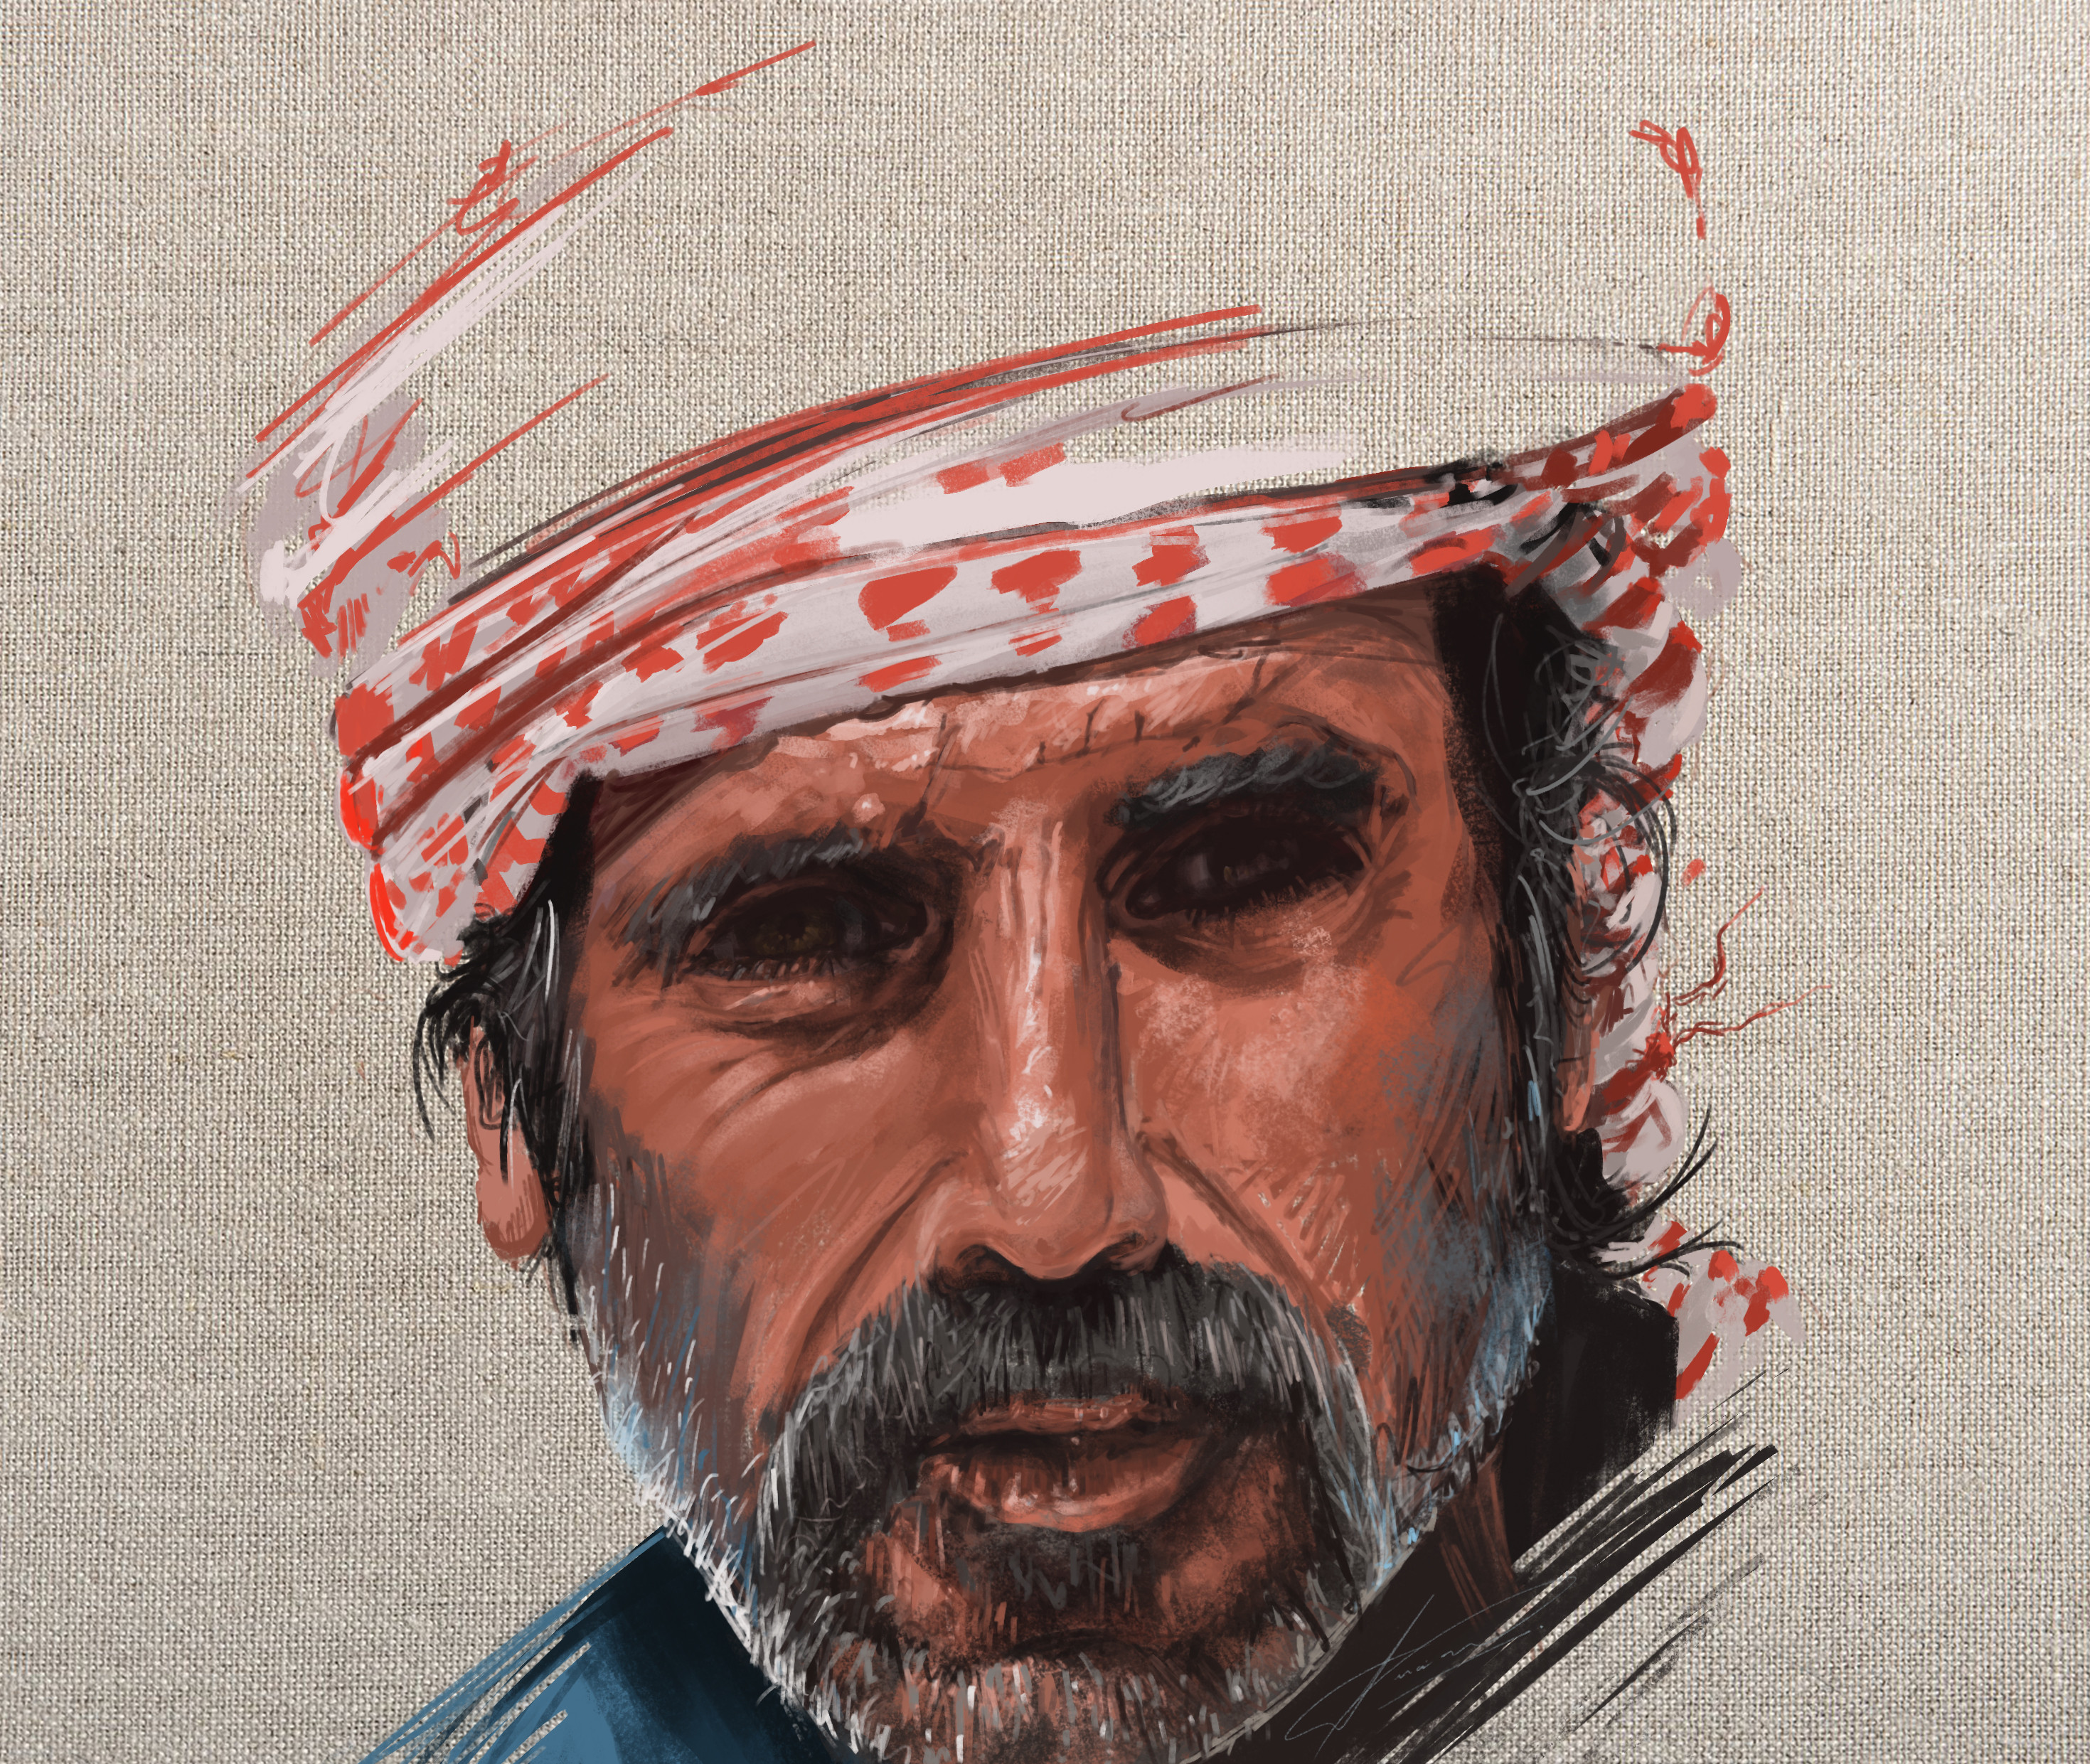 Artstation Bedouin Eyes Timelapse Luciano Neves